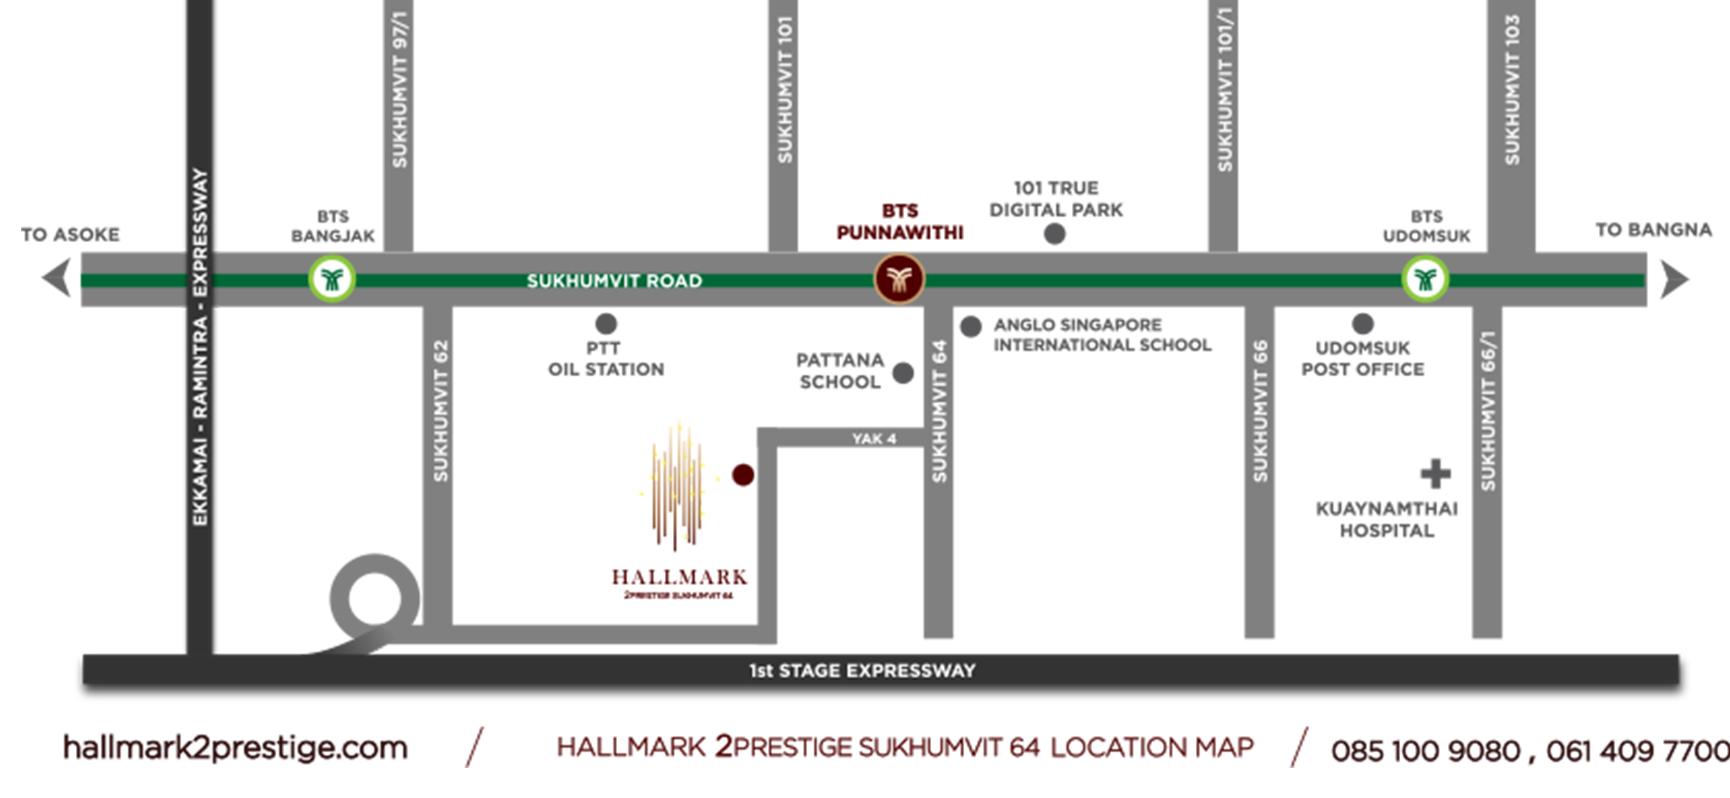 Hallmark 2 Prestige Sukhumvit 64 (ฮอลล์มาร์ค 2 เพรสทีจ สุขุมวิท 64)